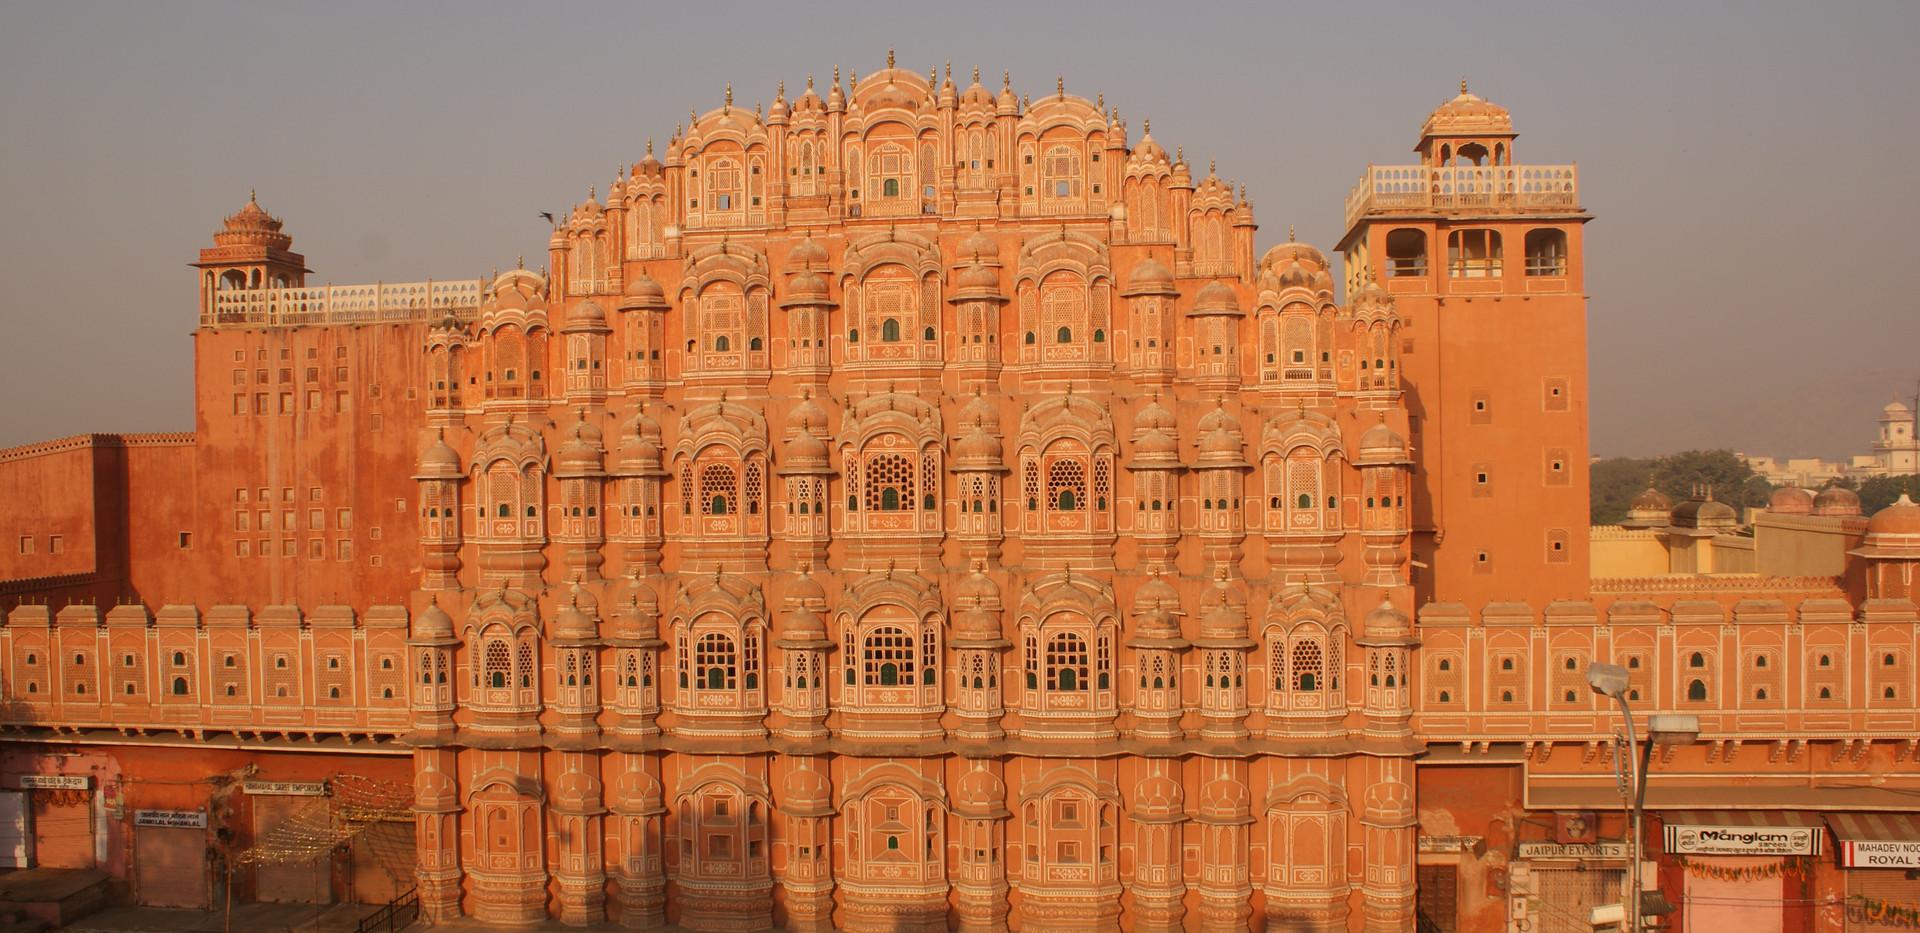 palace of winds2 - jaipur.JPG